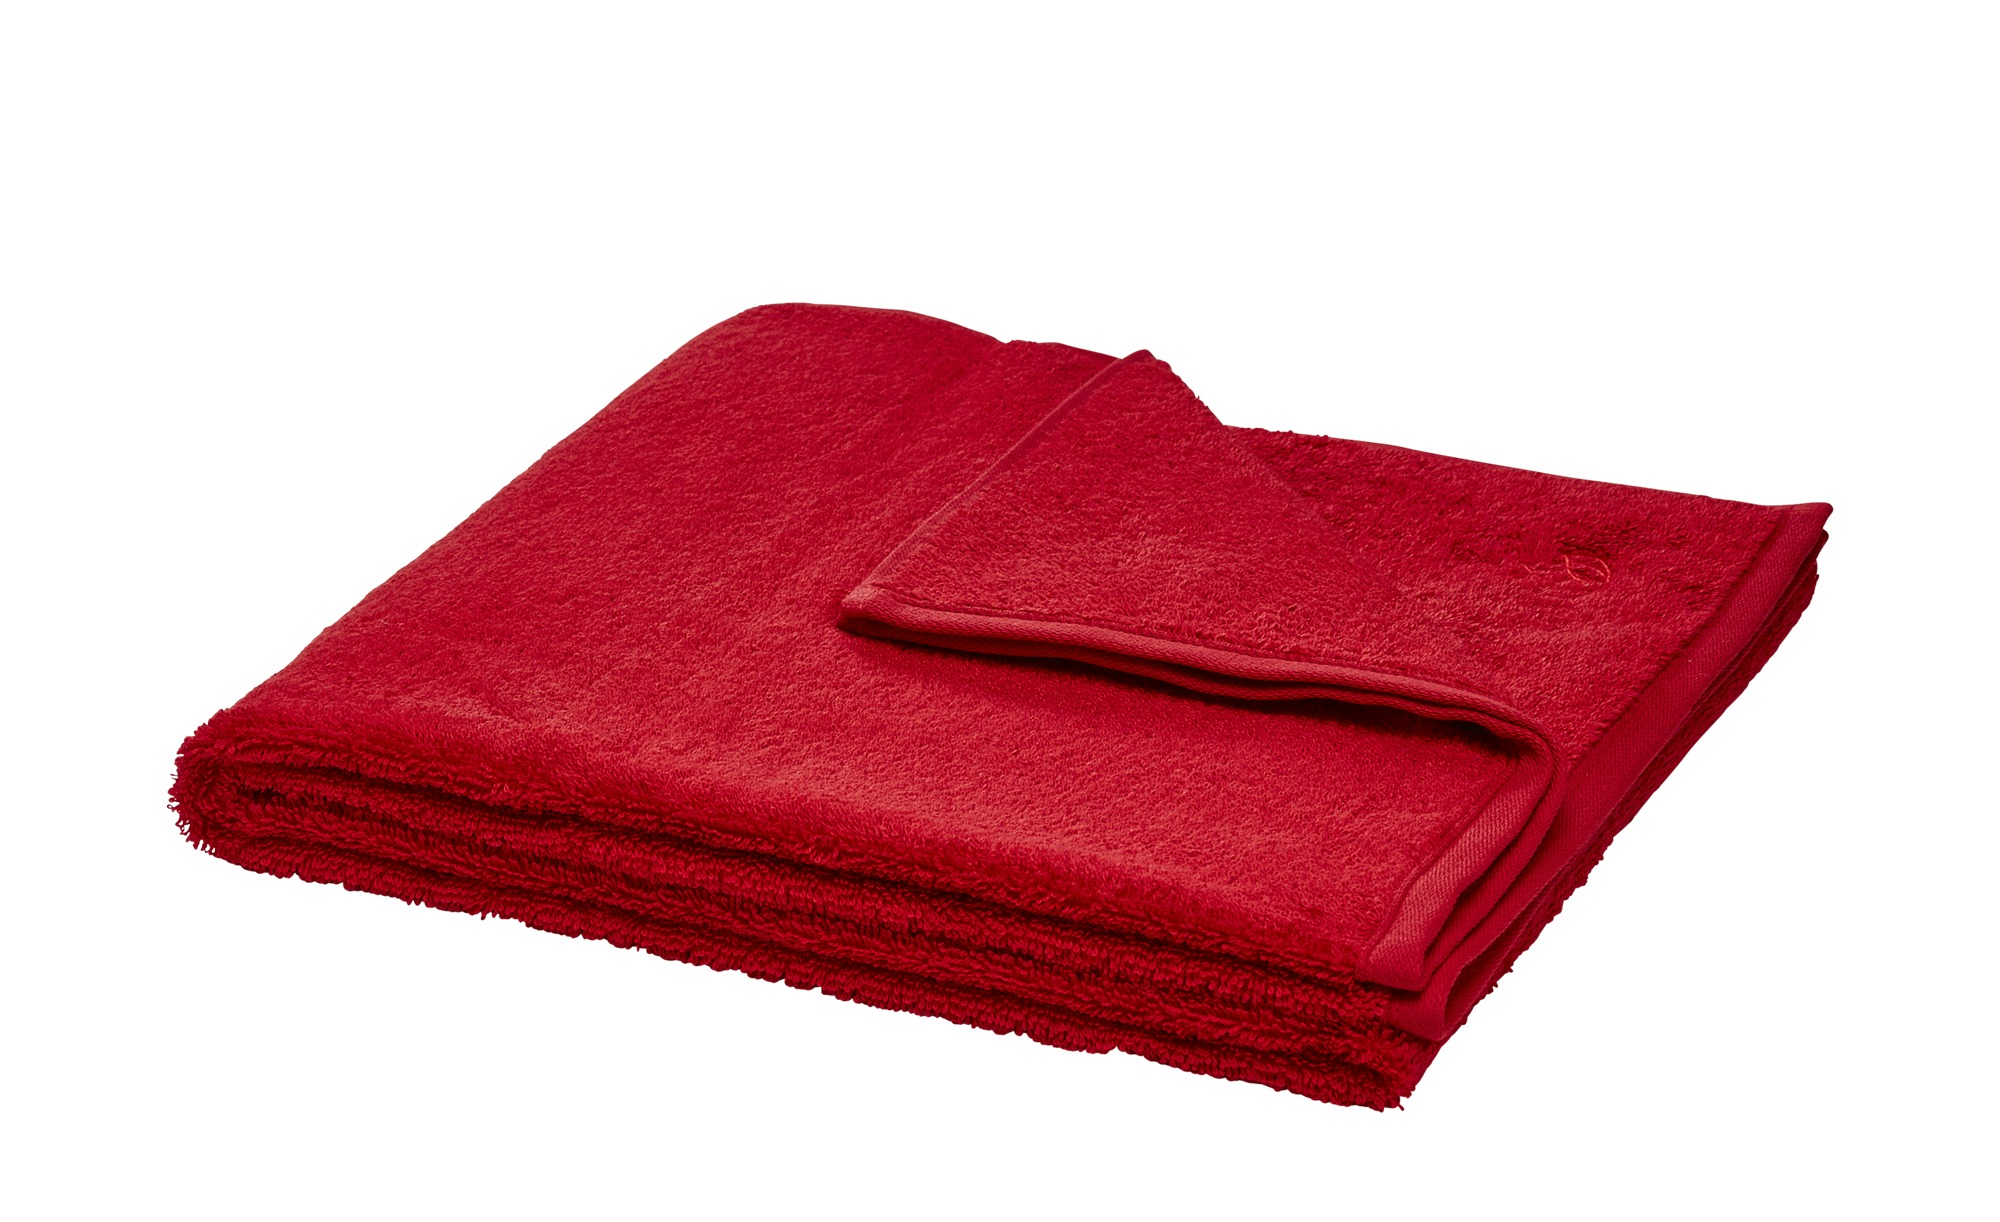 LAVIDA Duschtuch  Touch ¦ rot ¦ 100% Baumwolle ¦ Maße (cm): B: 67 Badtextilien und Zubehör > Handtücher & Badetücher > Duschtücher - Höffner